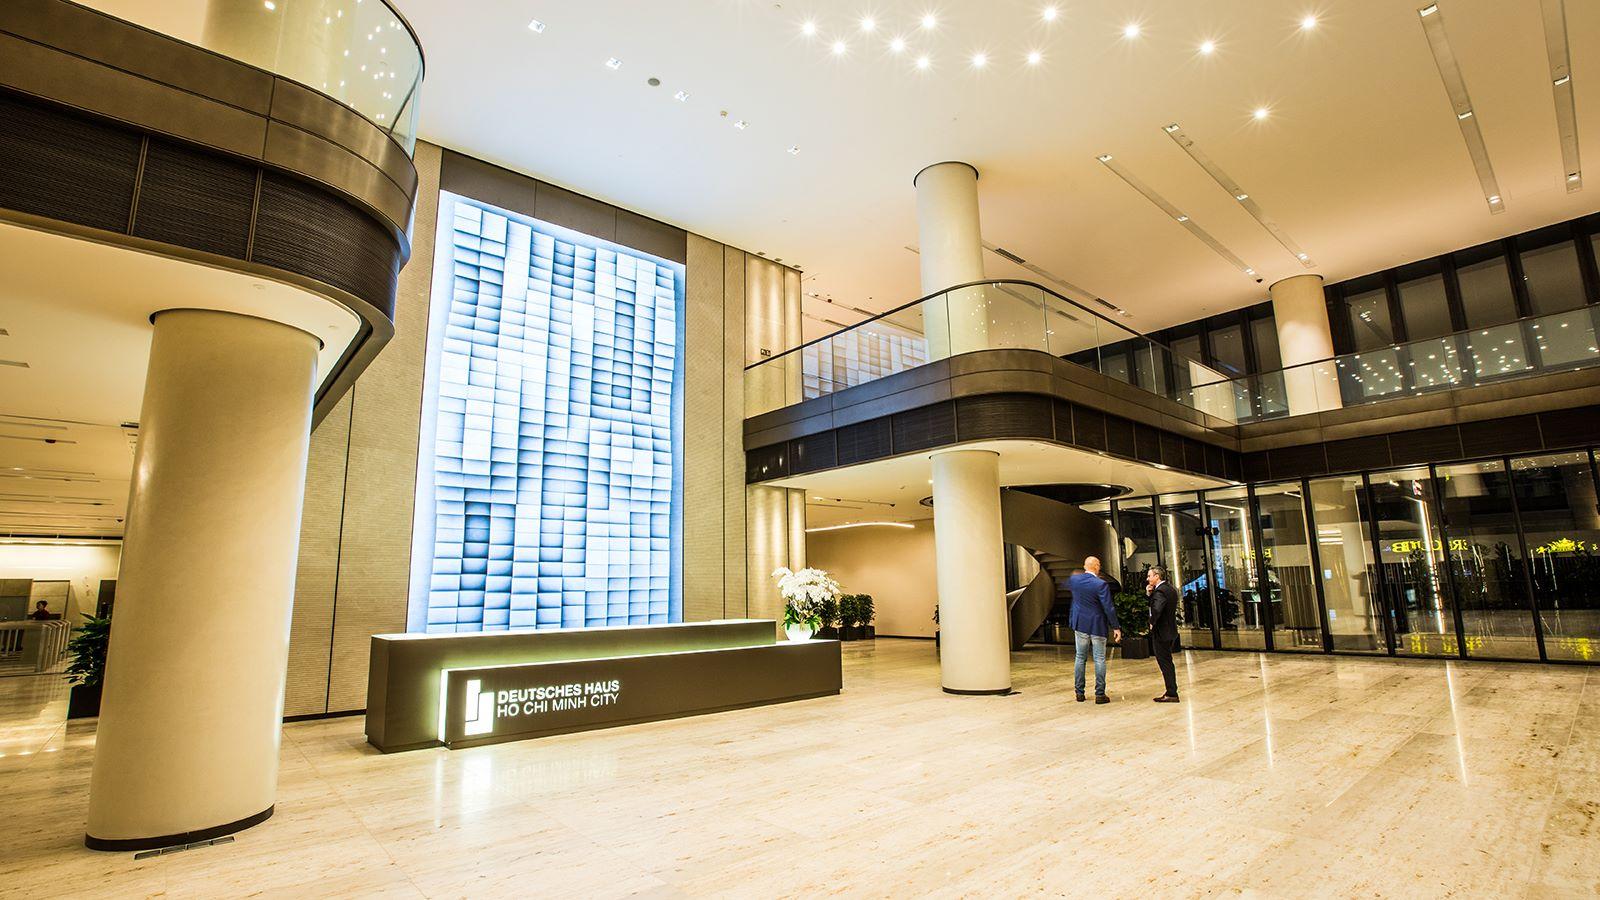 Deutsches Haus Building Reception Area - Mace Group